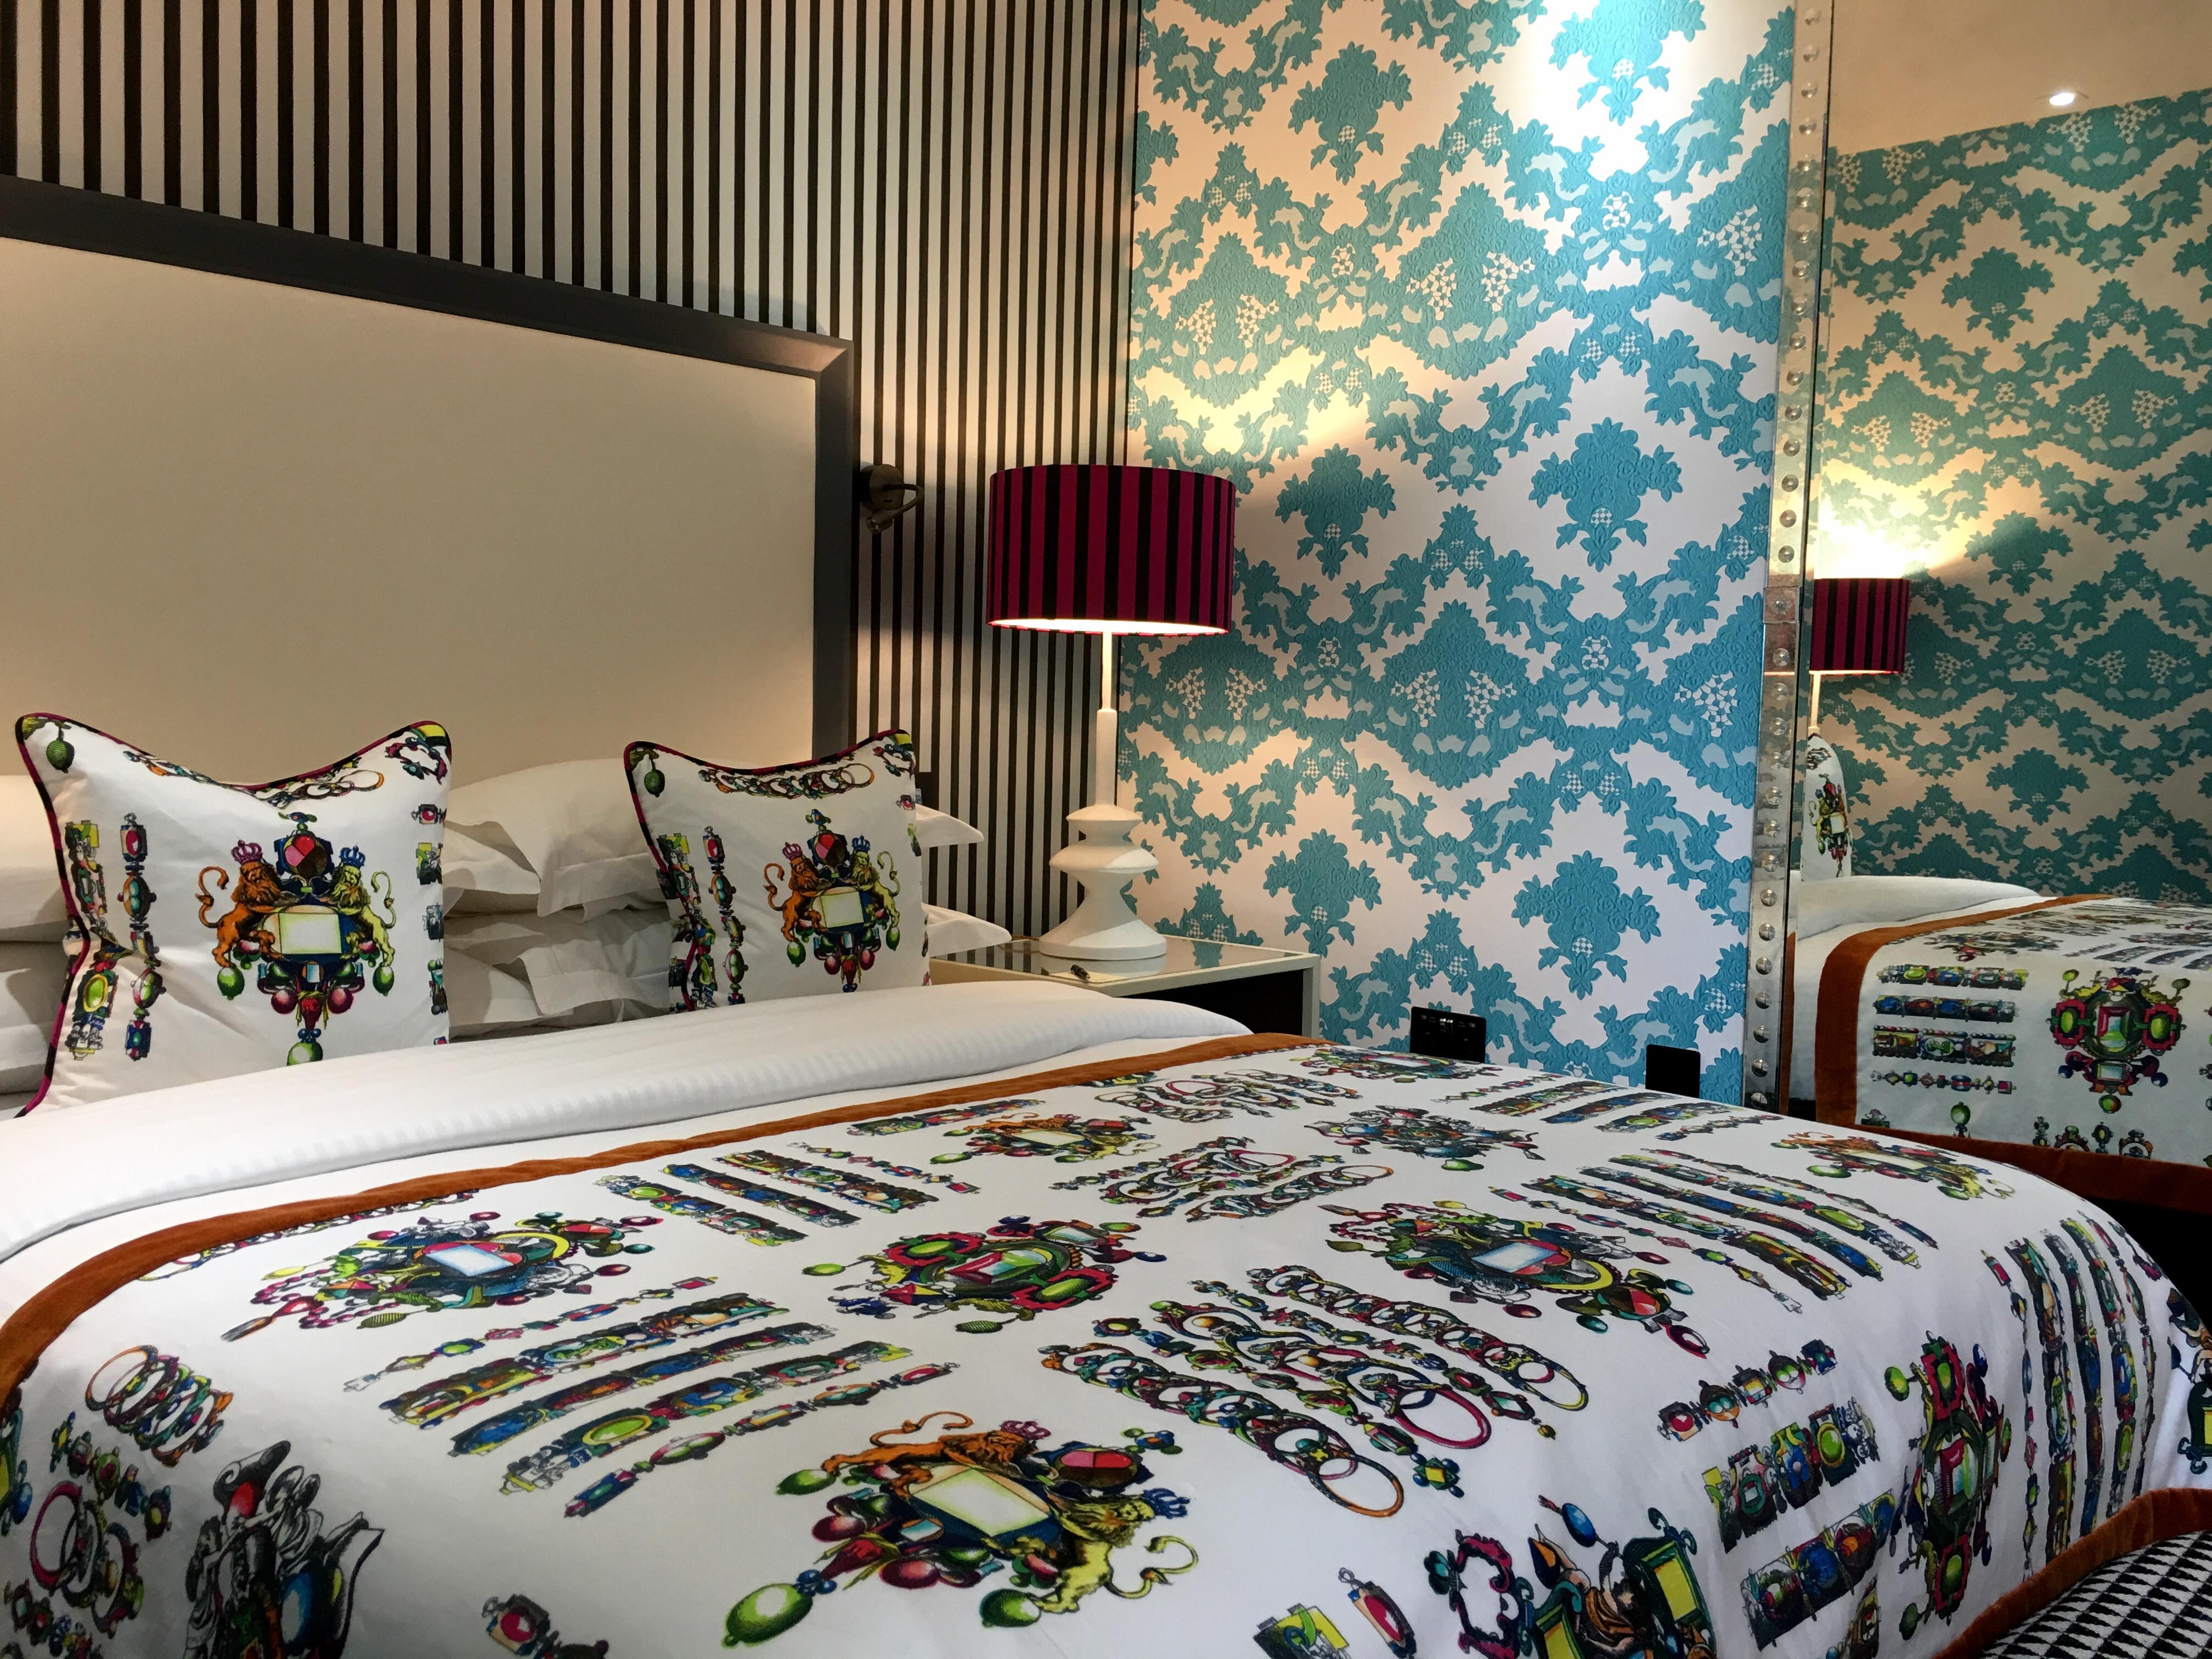 The Mandeville Hotel - London